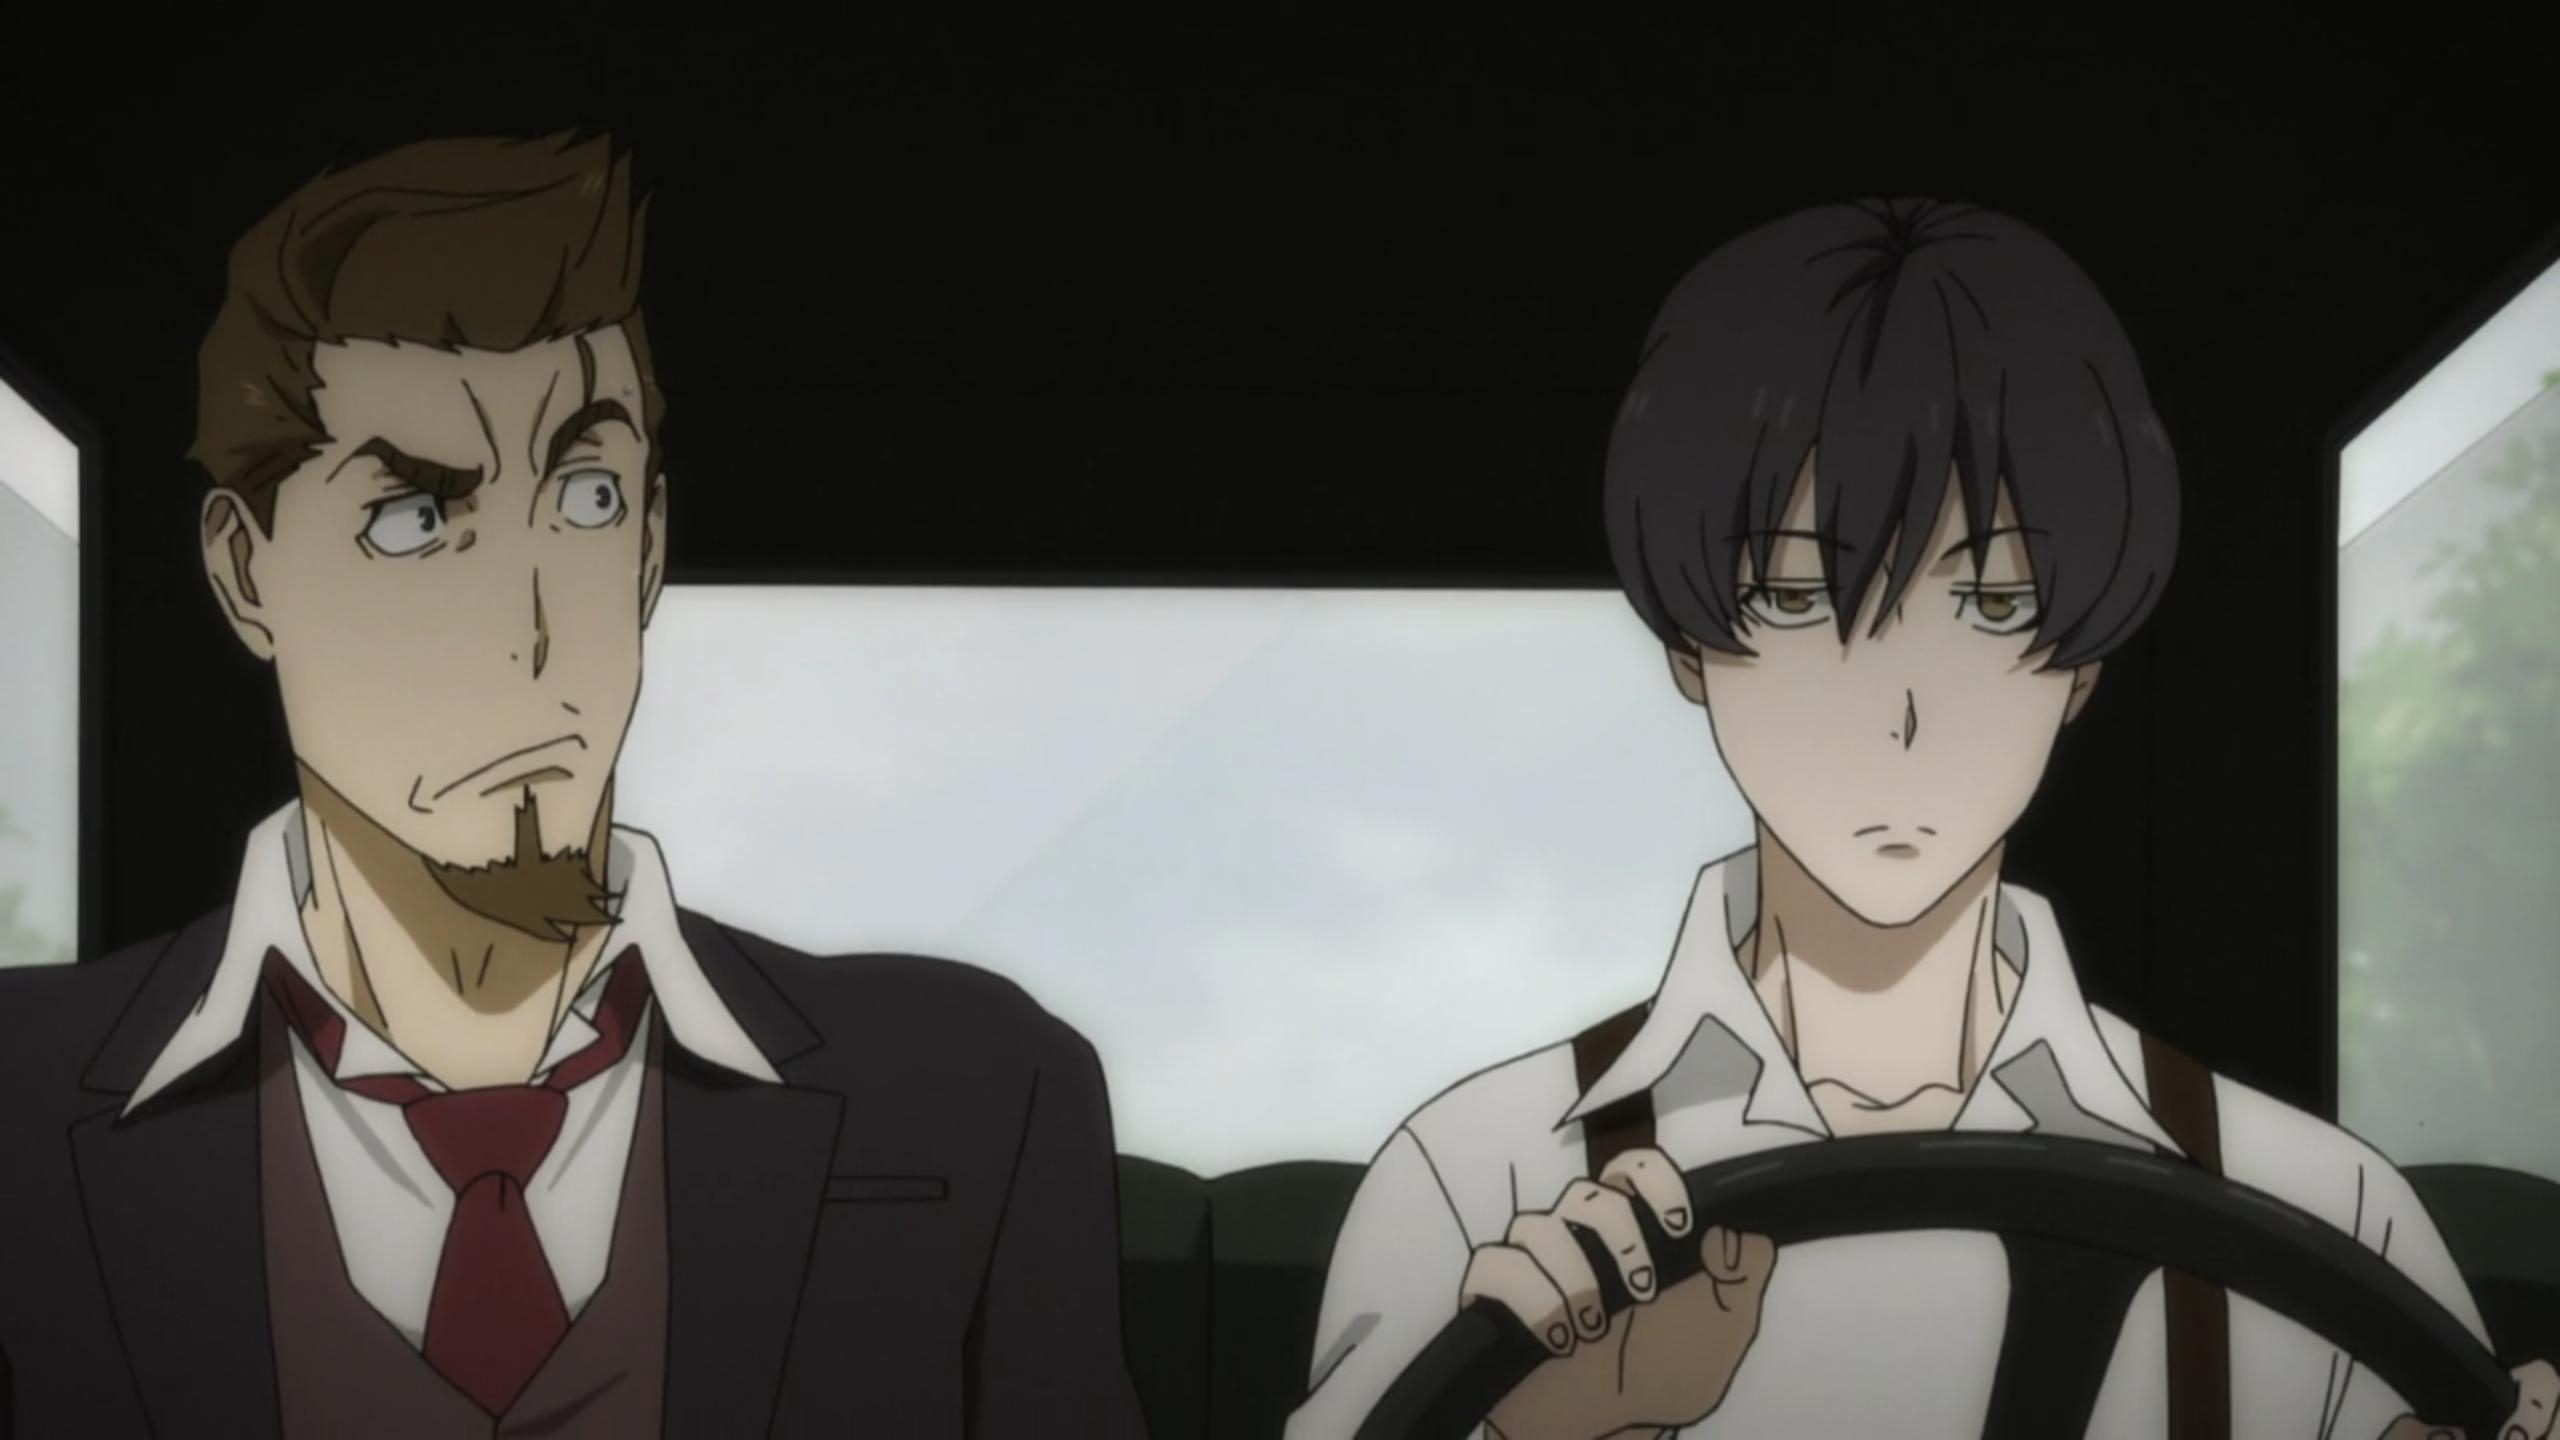 91 Days 12 48 Anime Evo